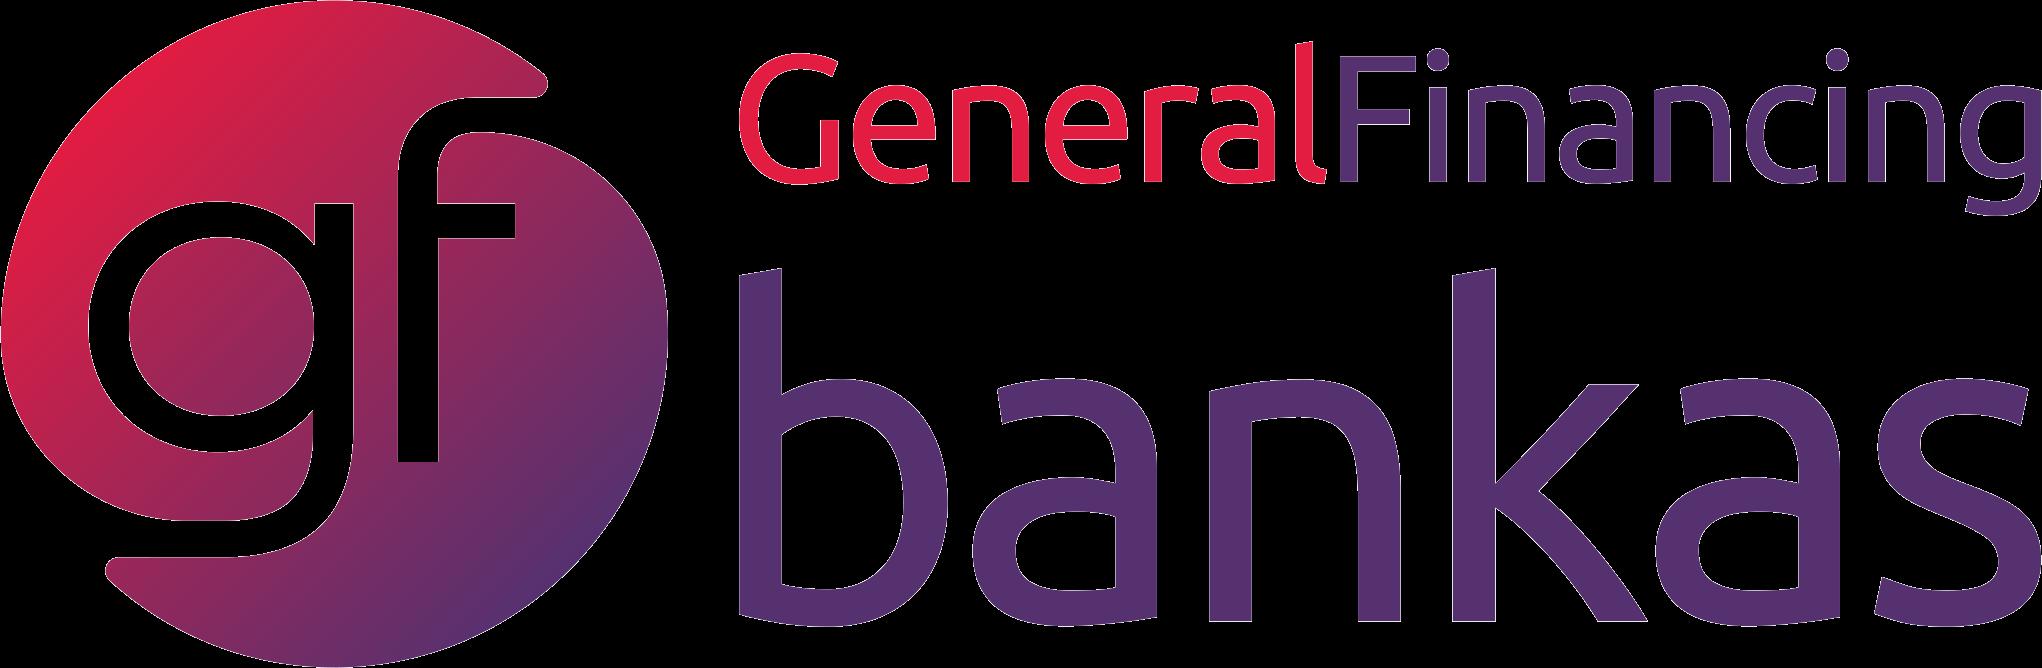 Vartojimo paskolos   GENERAL FINANCING BANKAS